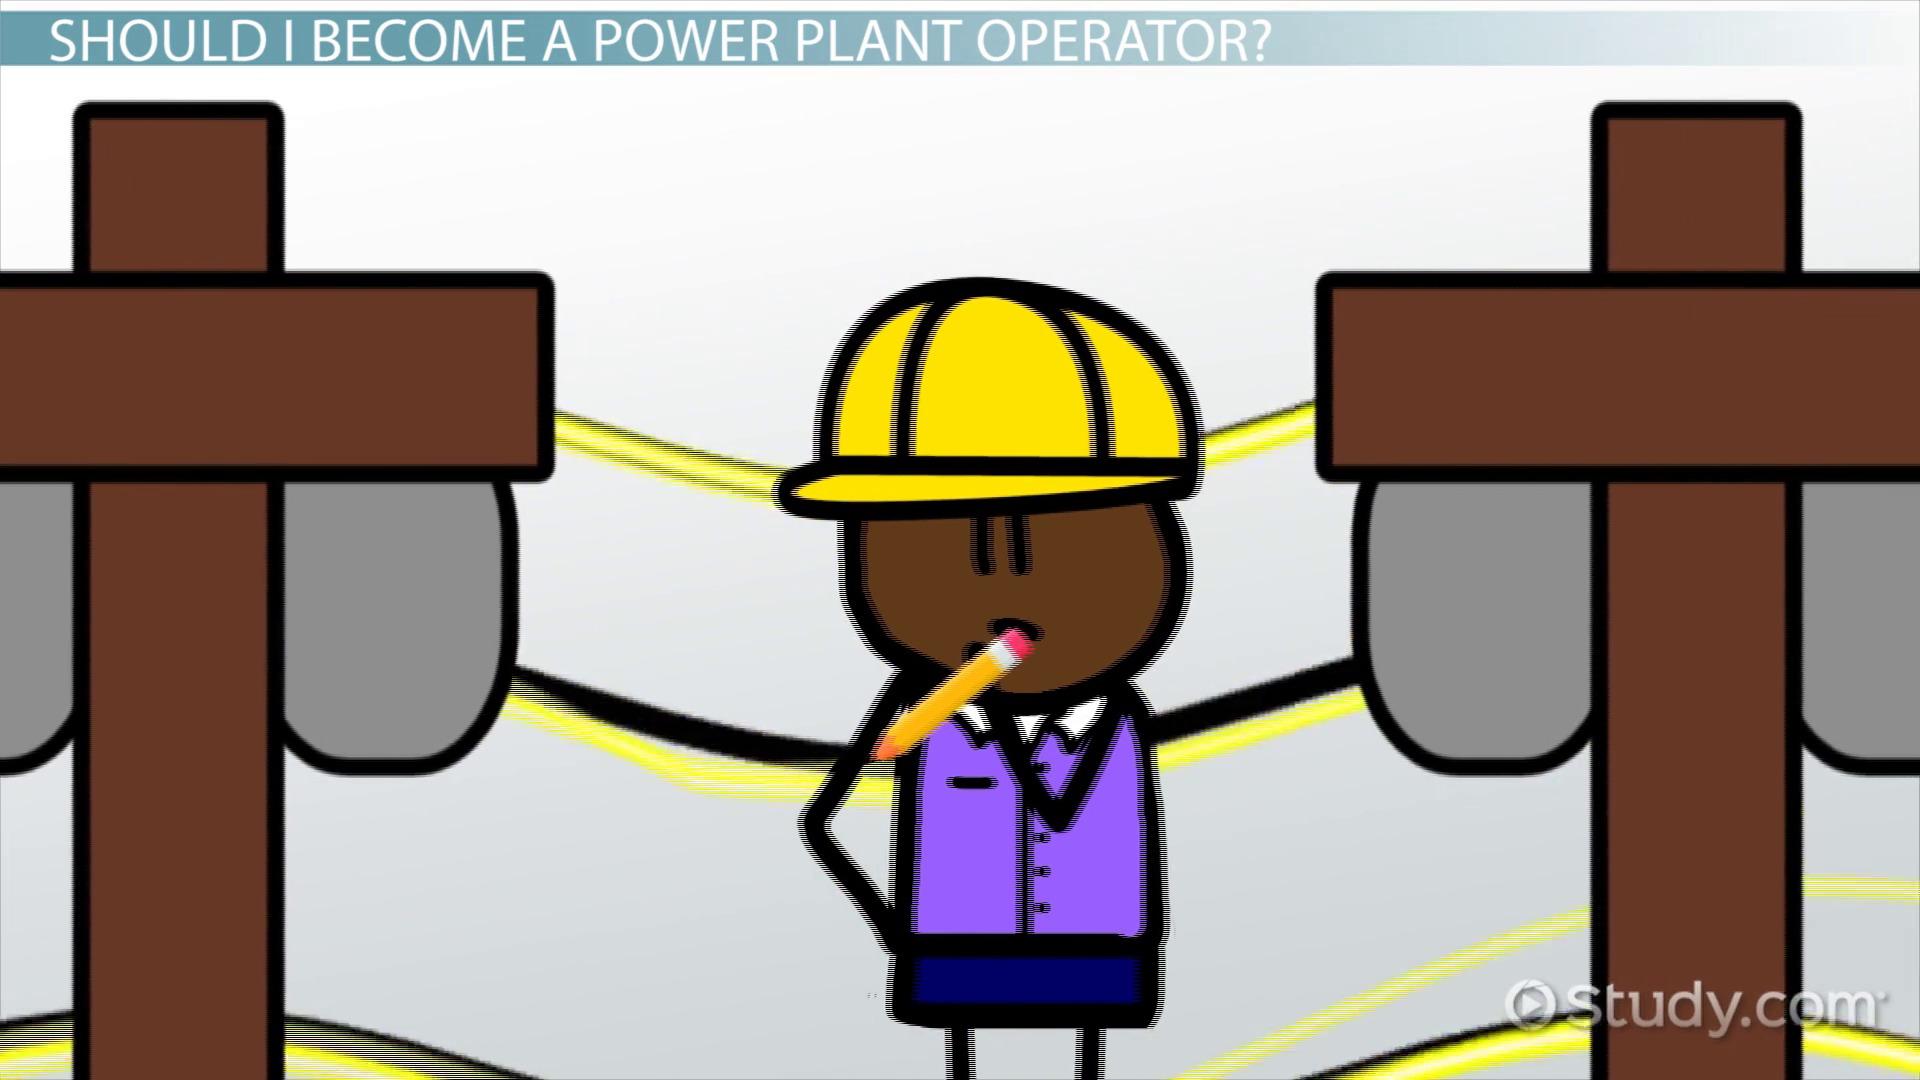 nuclear power plant engineer sample resume nuclear power plant engineer sample resume - Nuclear Engineer Sample Resume